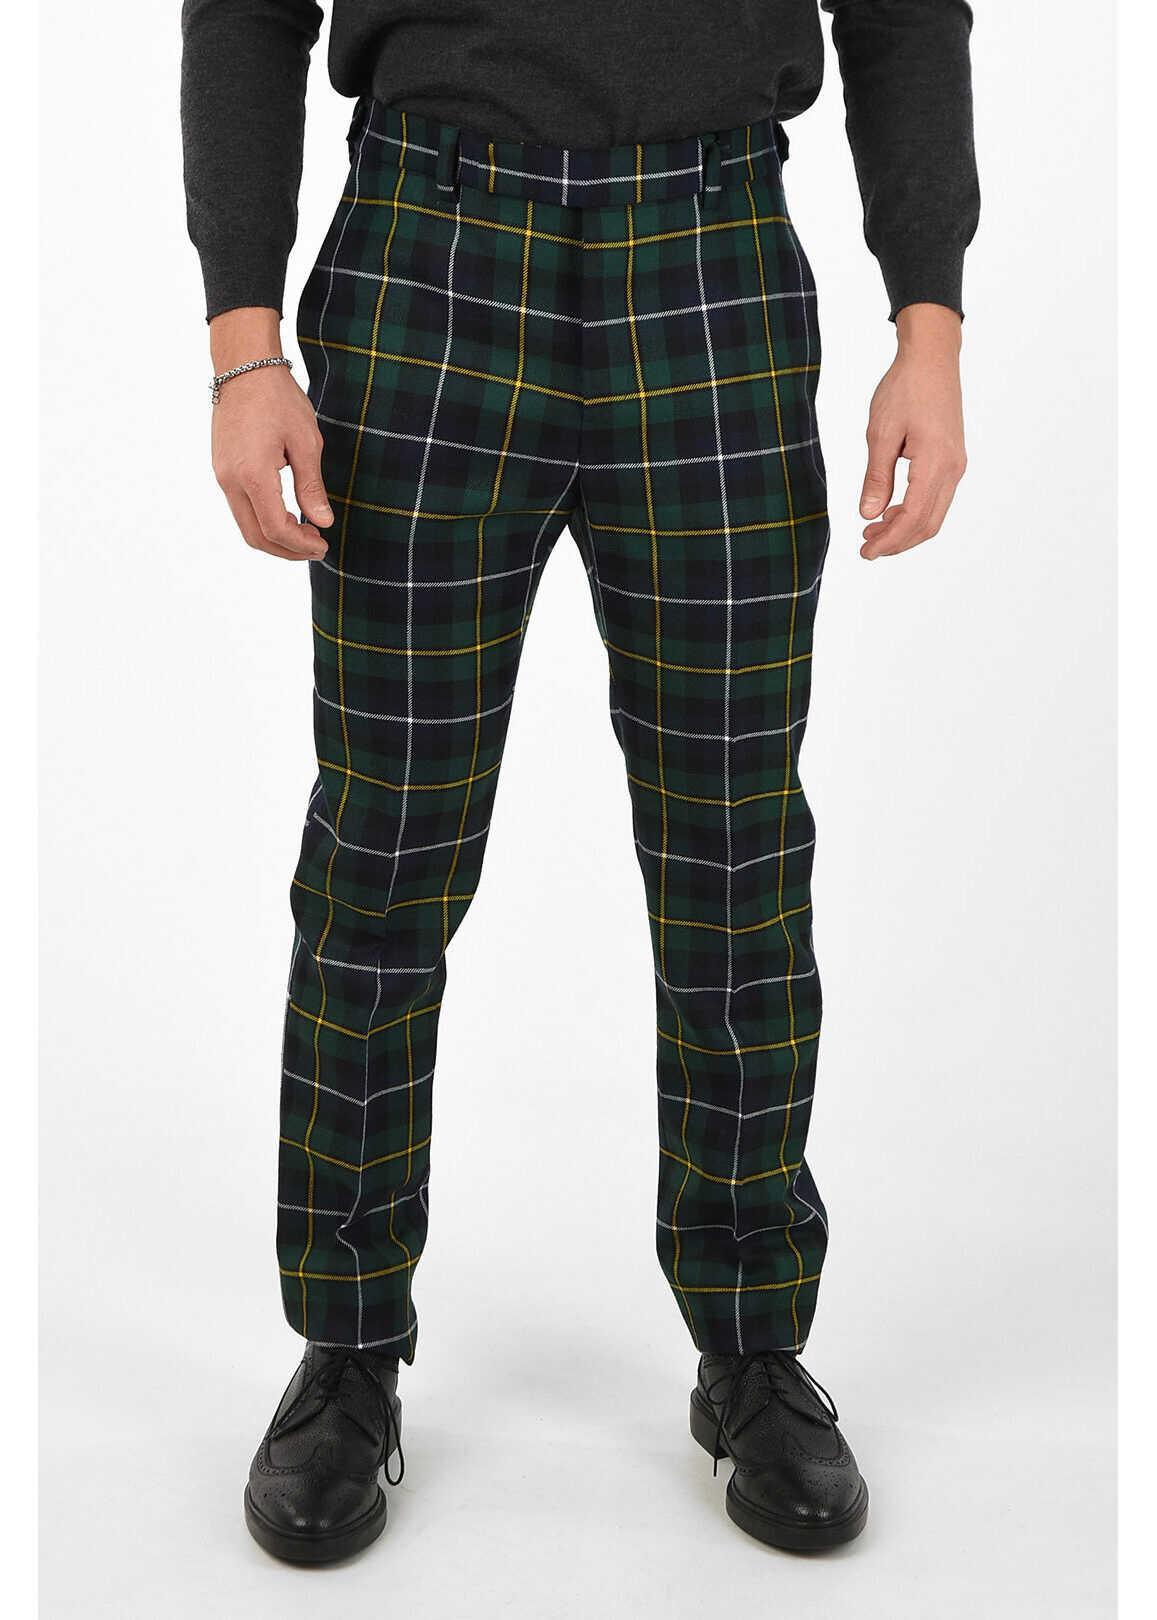 Versace plaid Mid waist plain hem trousers GREEN imagine